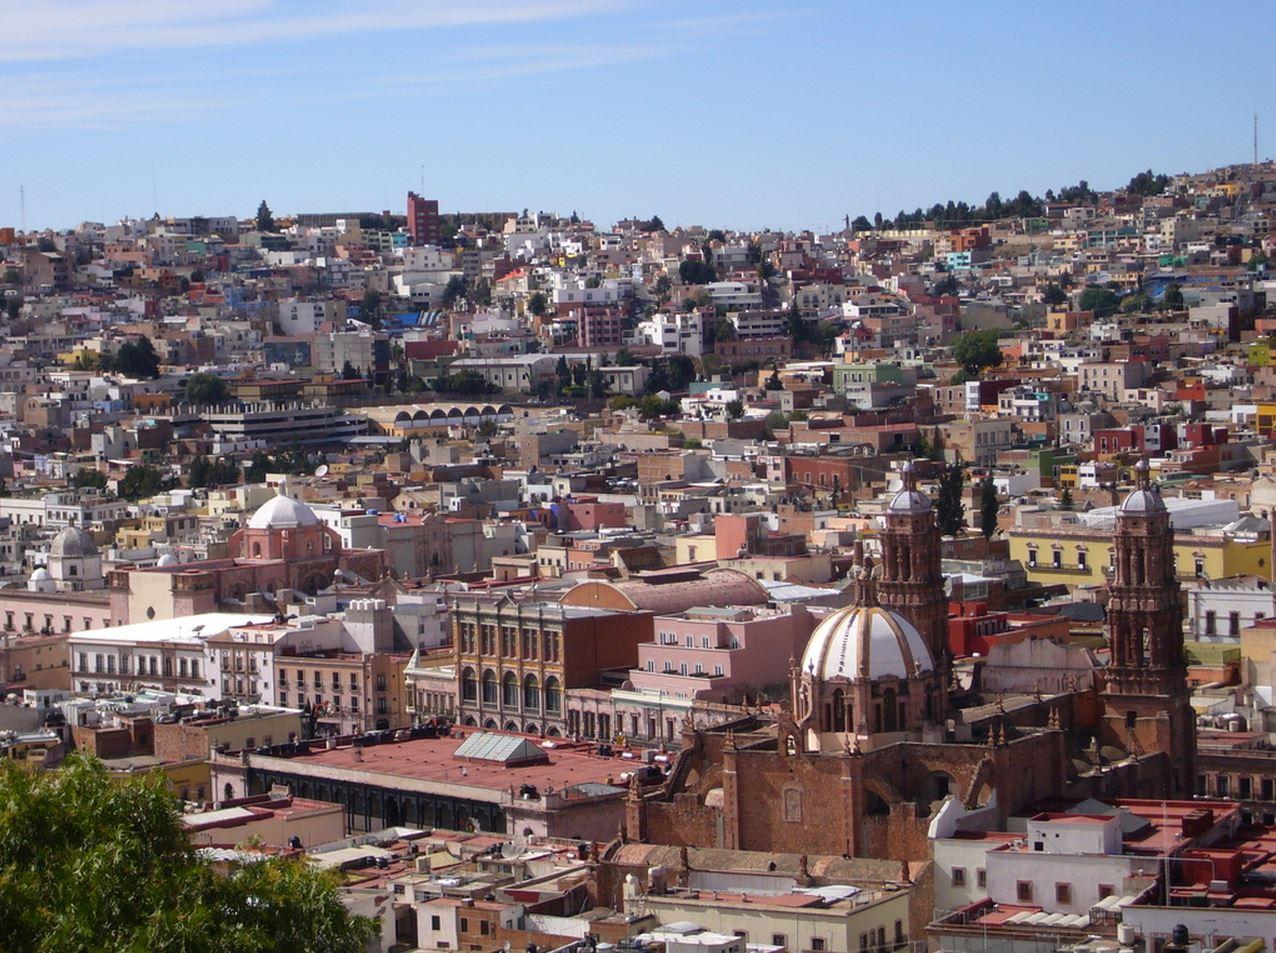 City of Zacatecas, Mexico